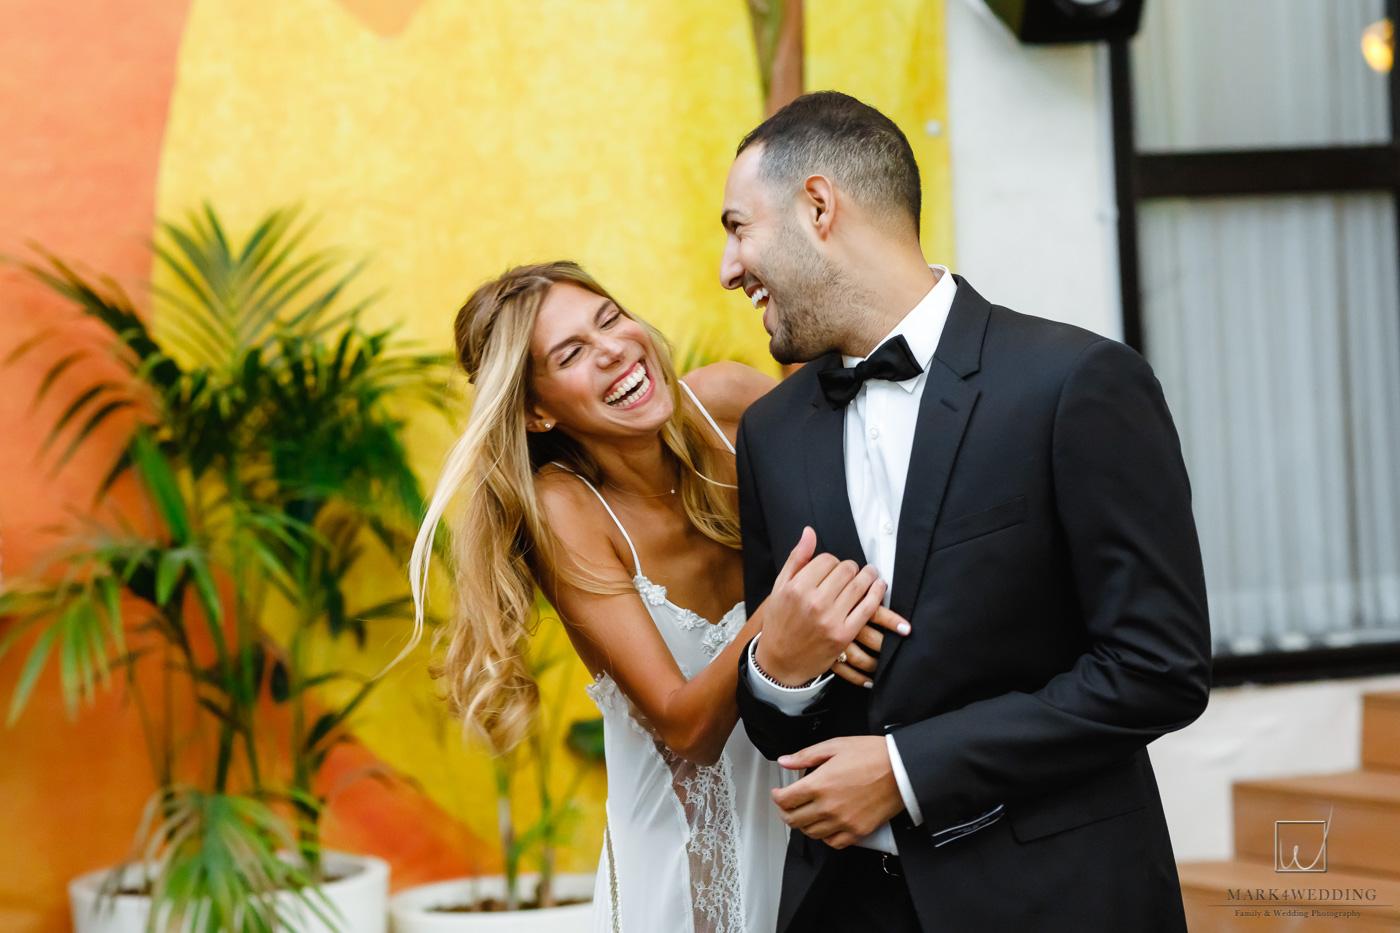 Topaz+Roee_wedding_0159.jpg